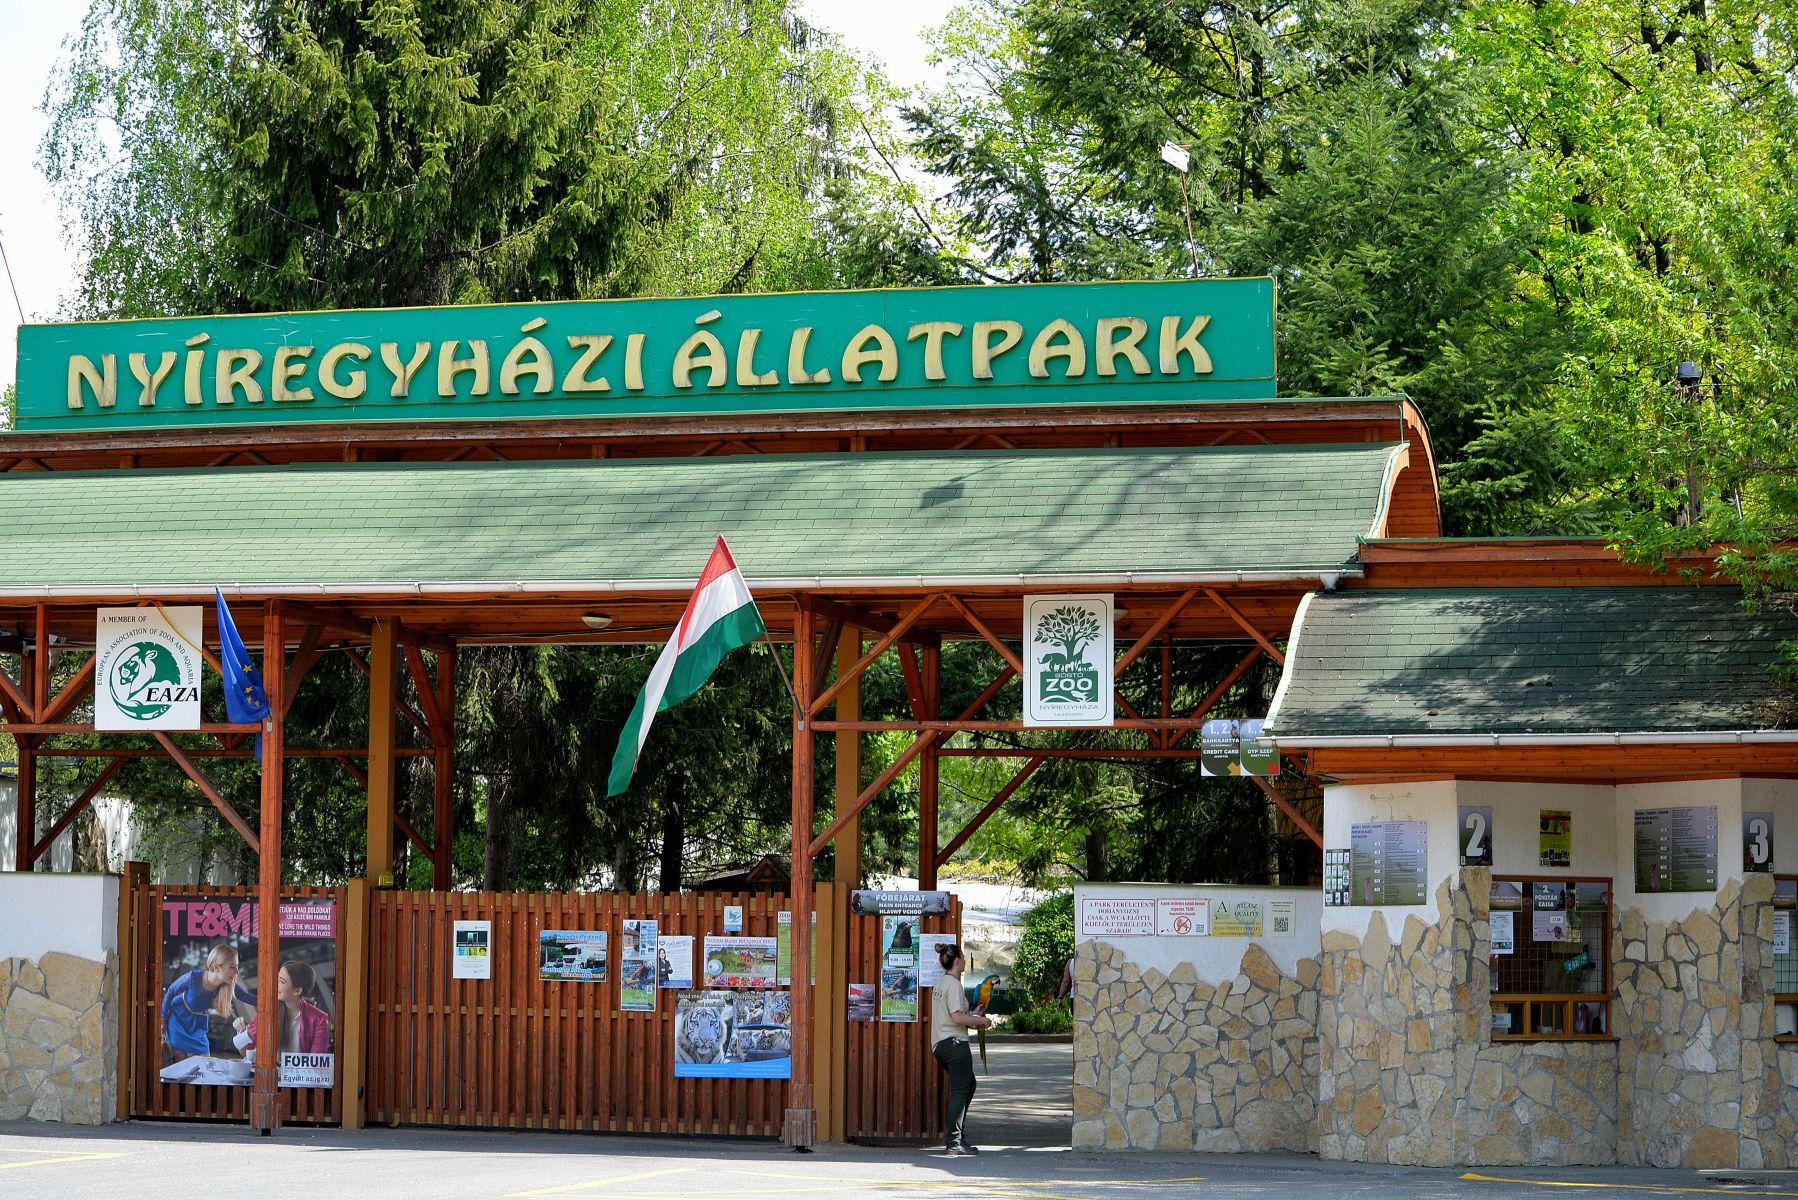 nyh_allatpark_150427_120.JPG